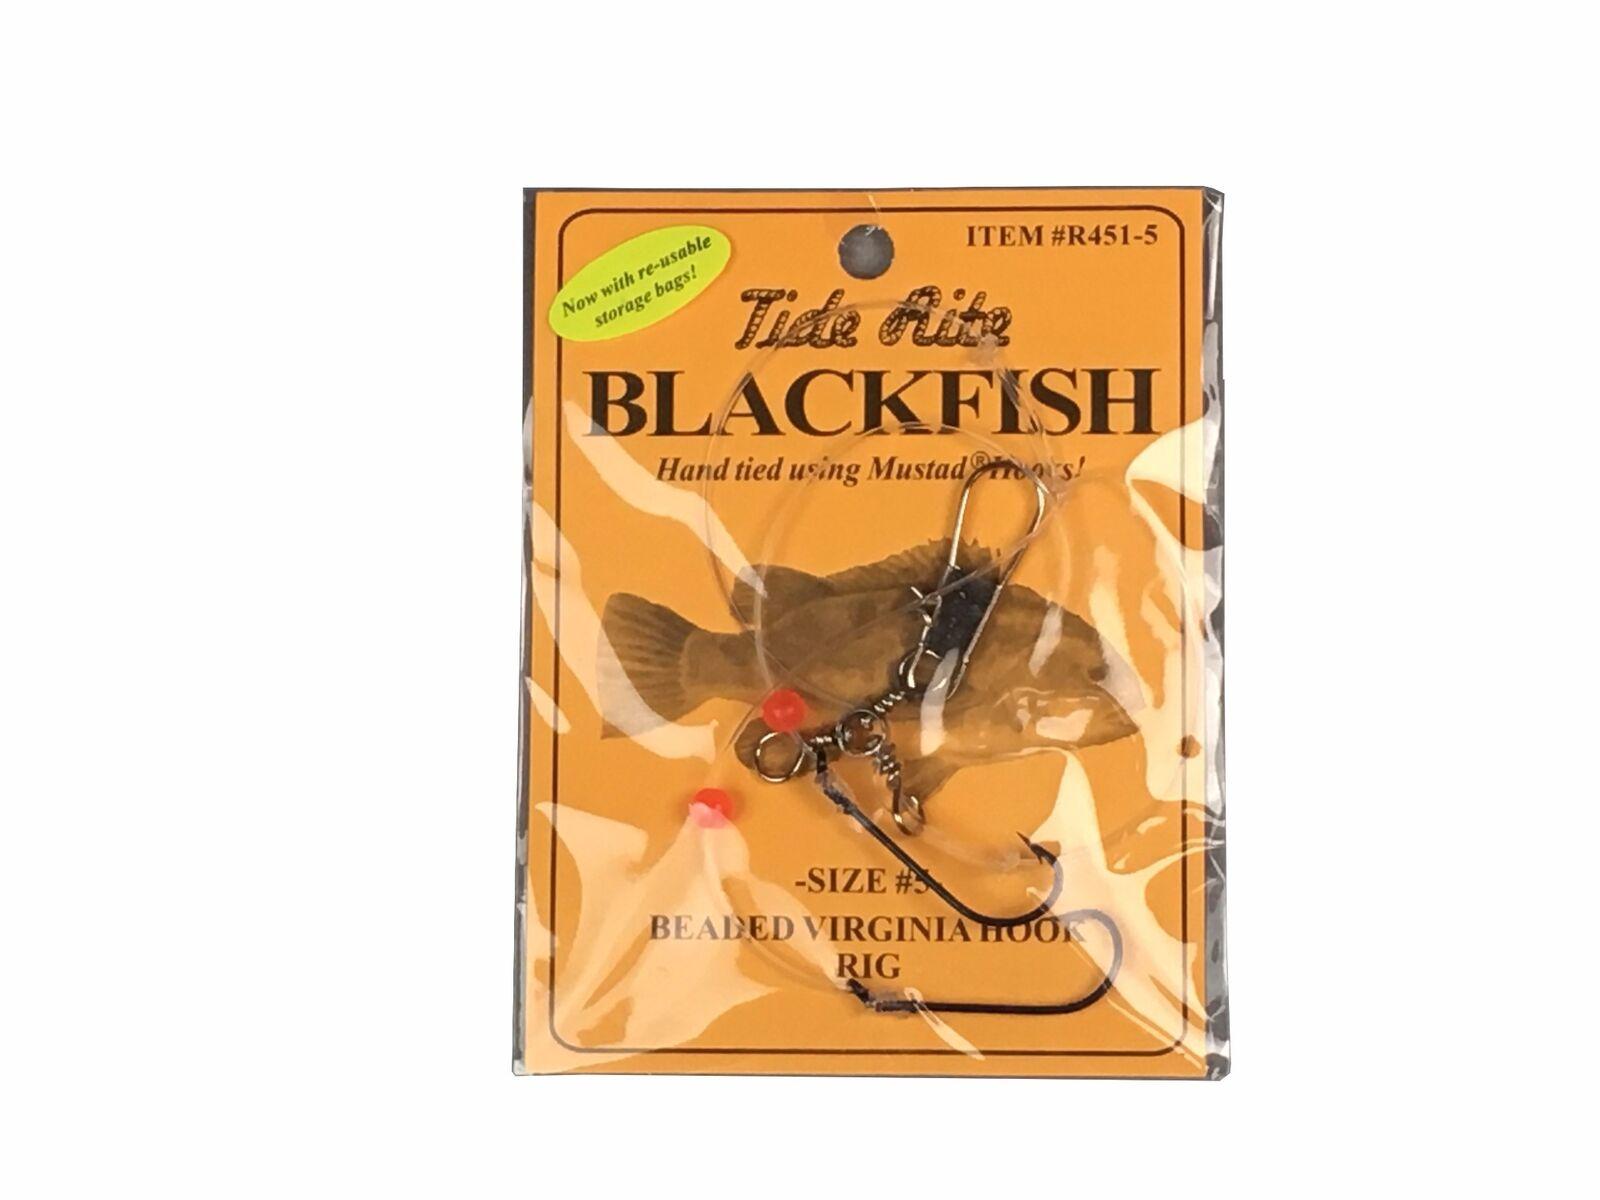 1 BLACKFISH TAUTOG FISHING RIGS TIDE RITE R451-4 BEADED VIRGINIA 2 HOOK RIG